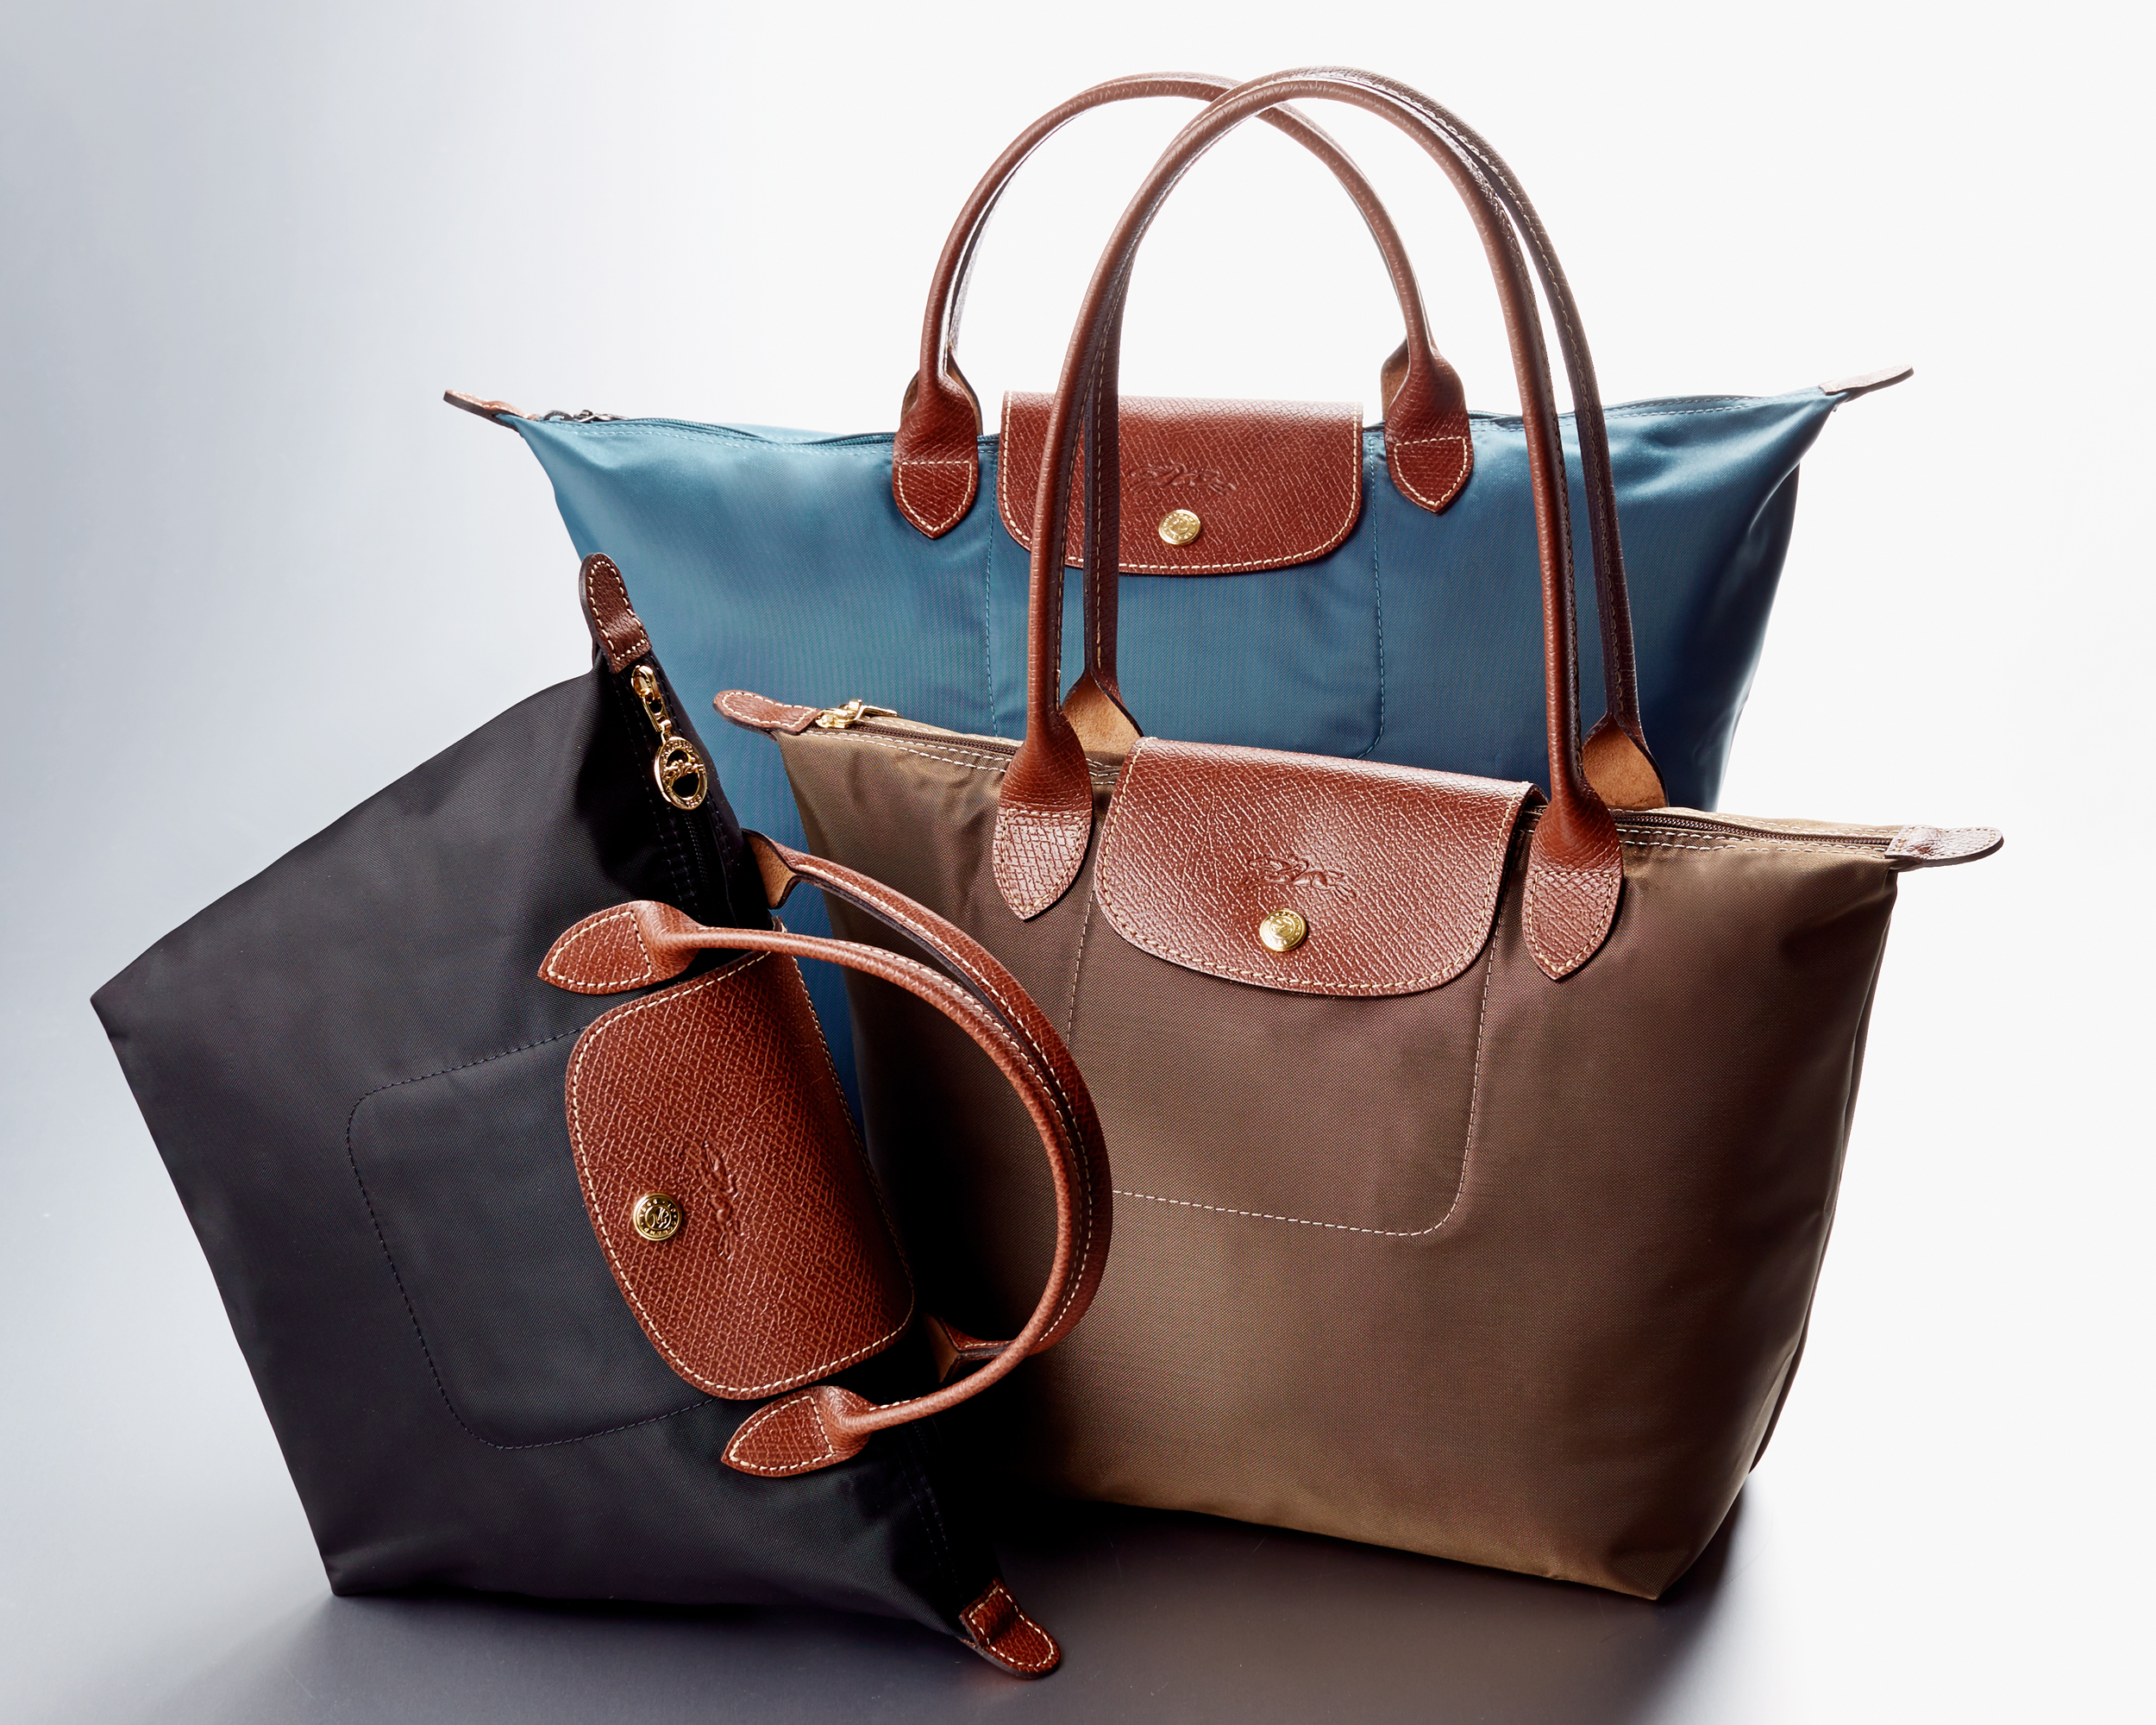 Longchamp_repeat_WACC_1080320259_242.jpg